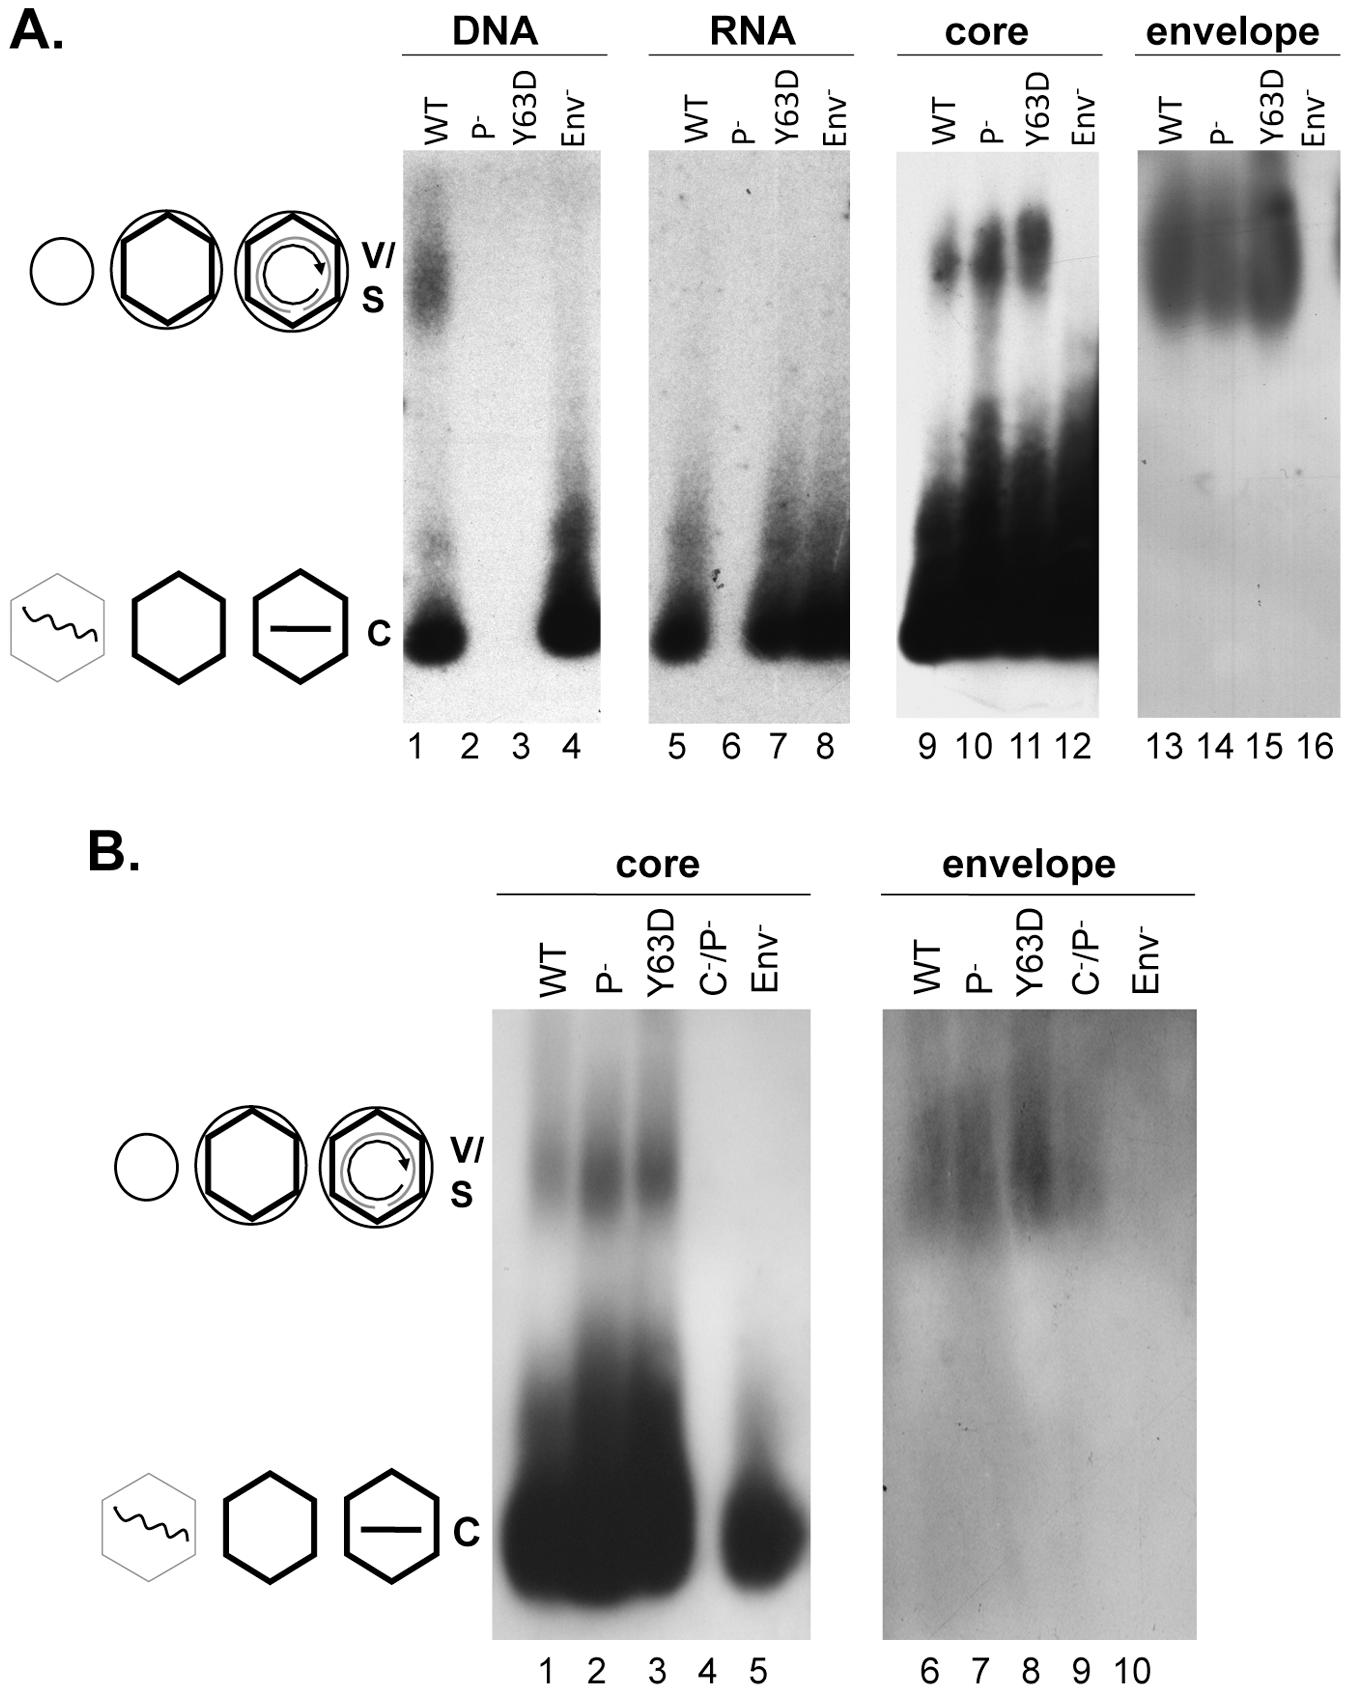 Analyses of HBV virion secretion by native agarose gel electrophoresis.